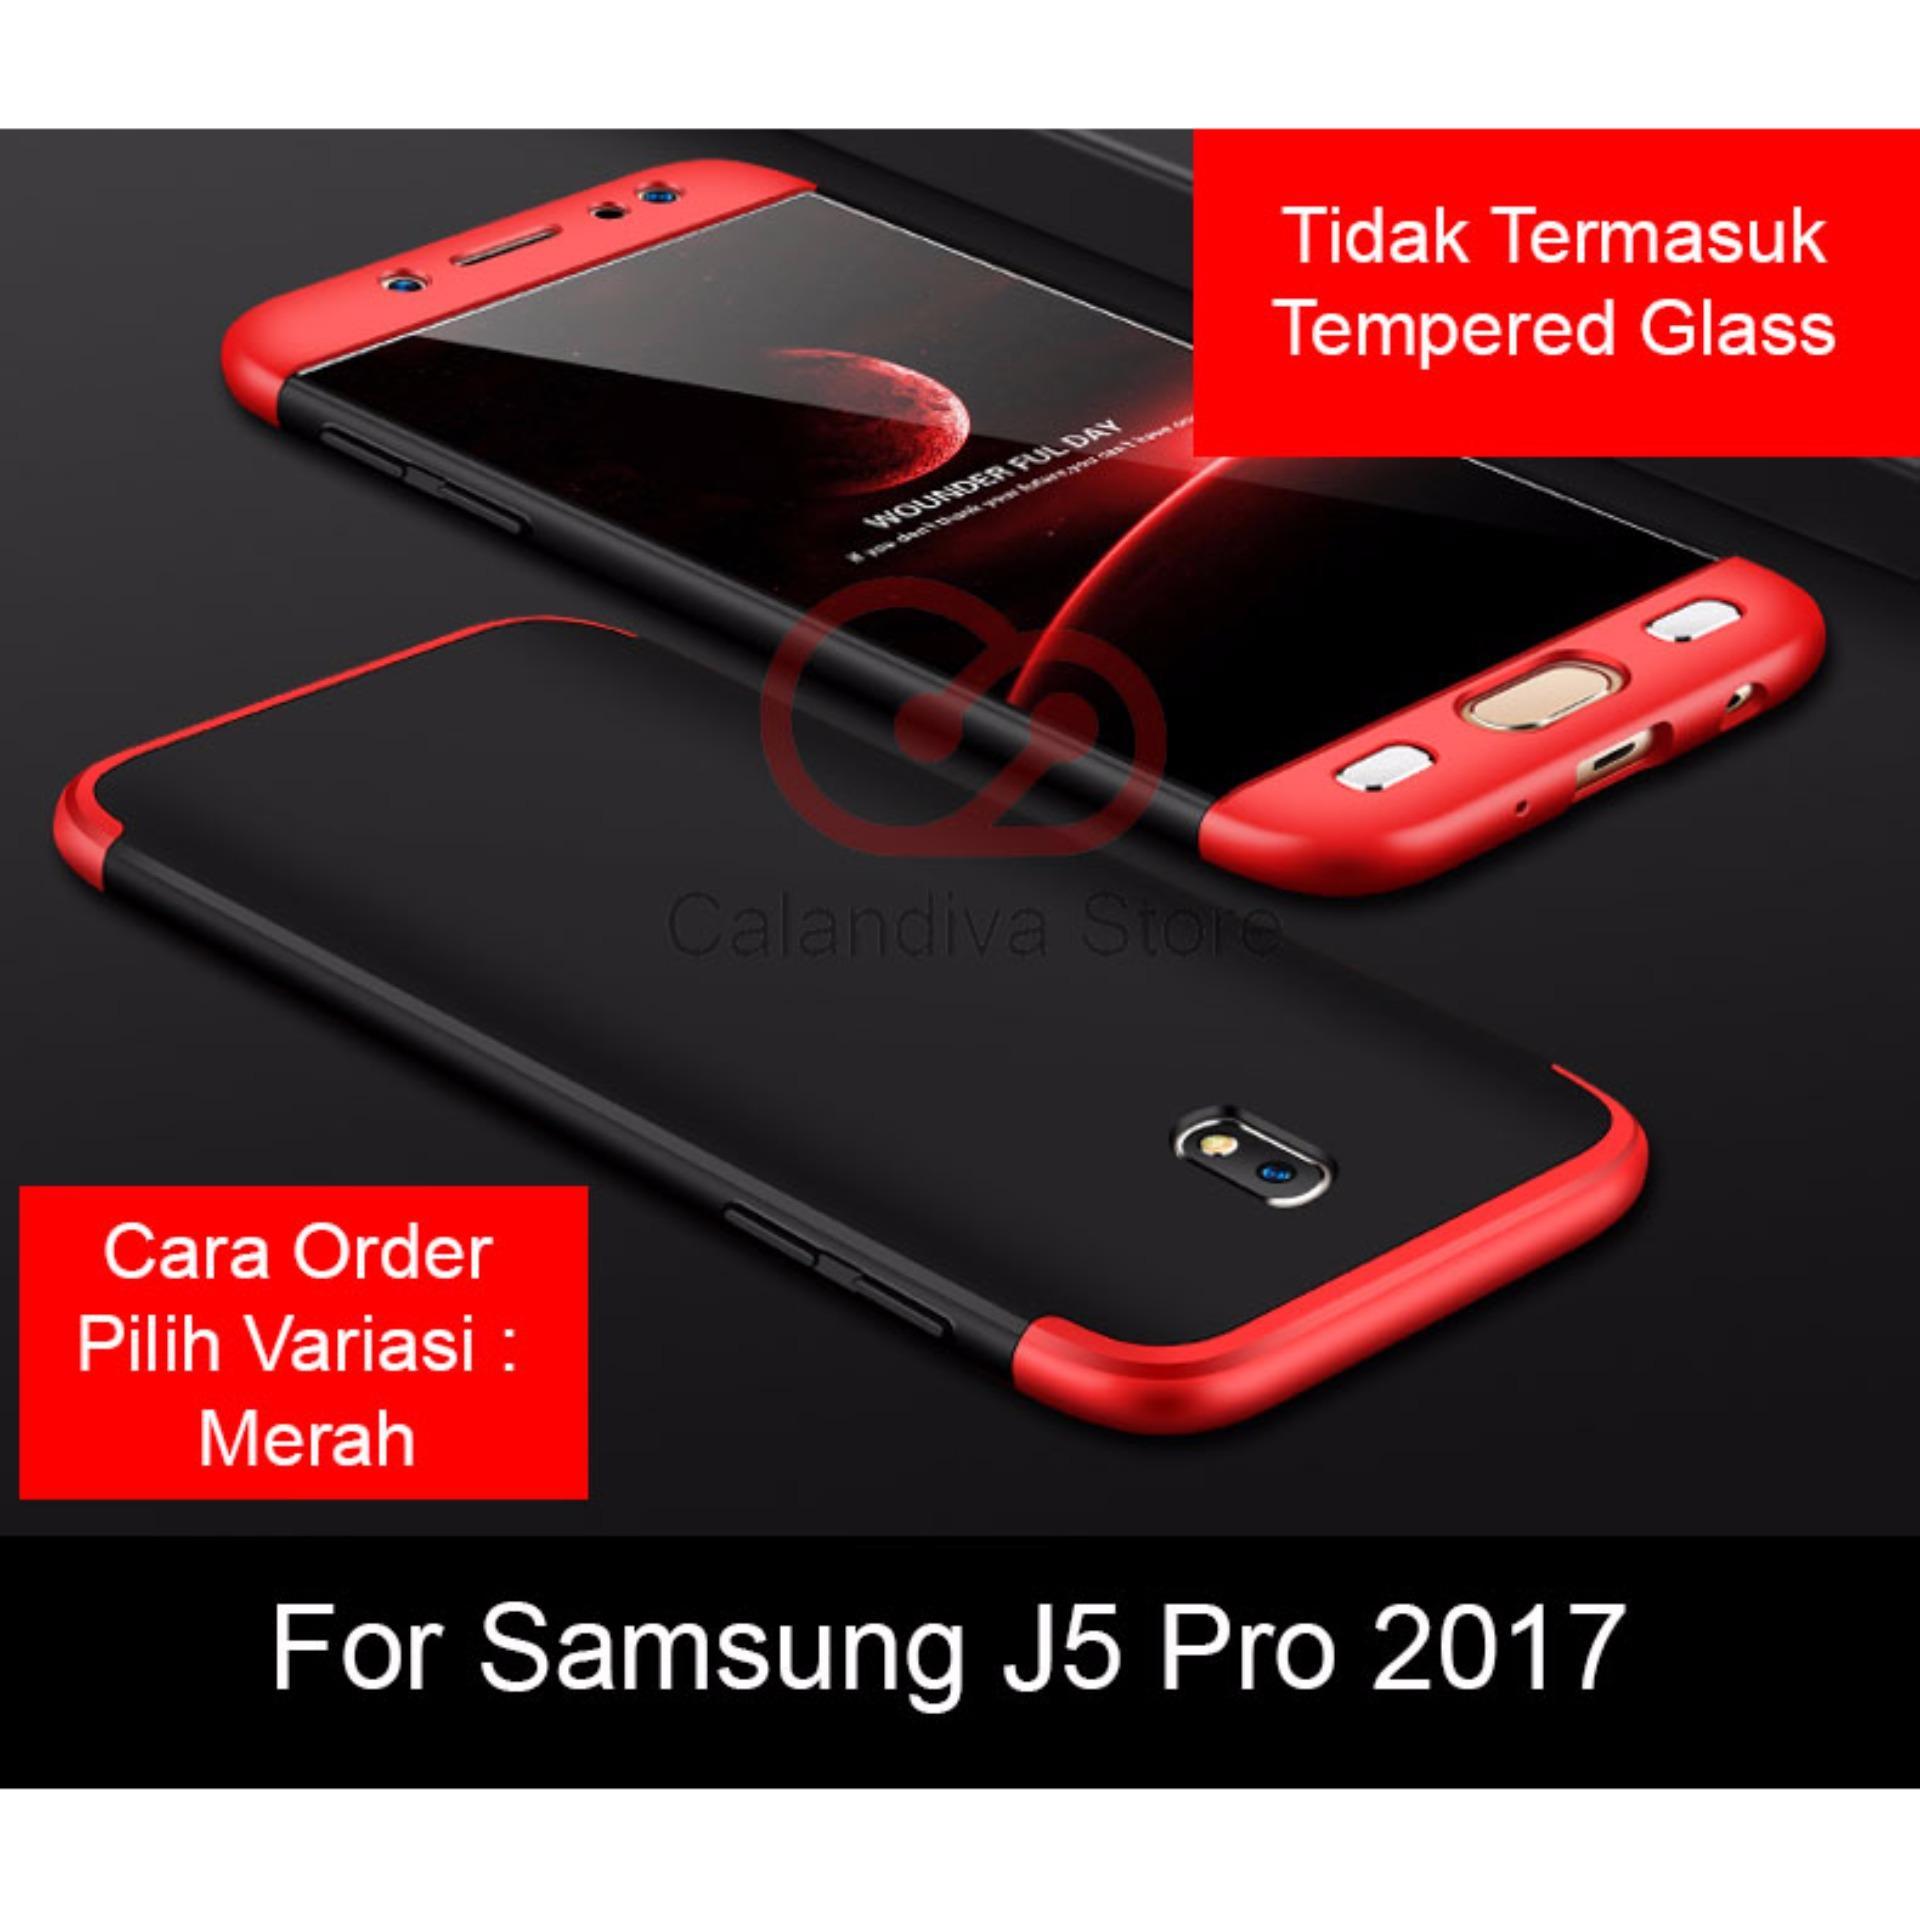 Cari Harga Termurah Ume Vivo V5 Flip Cover / Flipshell / Leather Case Sarung / Sarung. Source ... Sarung HP / View - Cream. Source · Dimana Beli. Source .